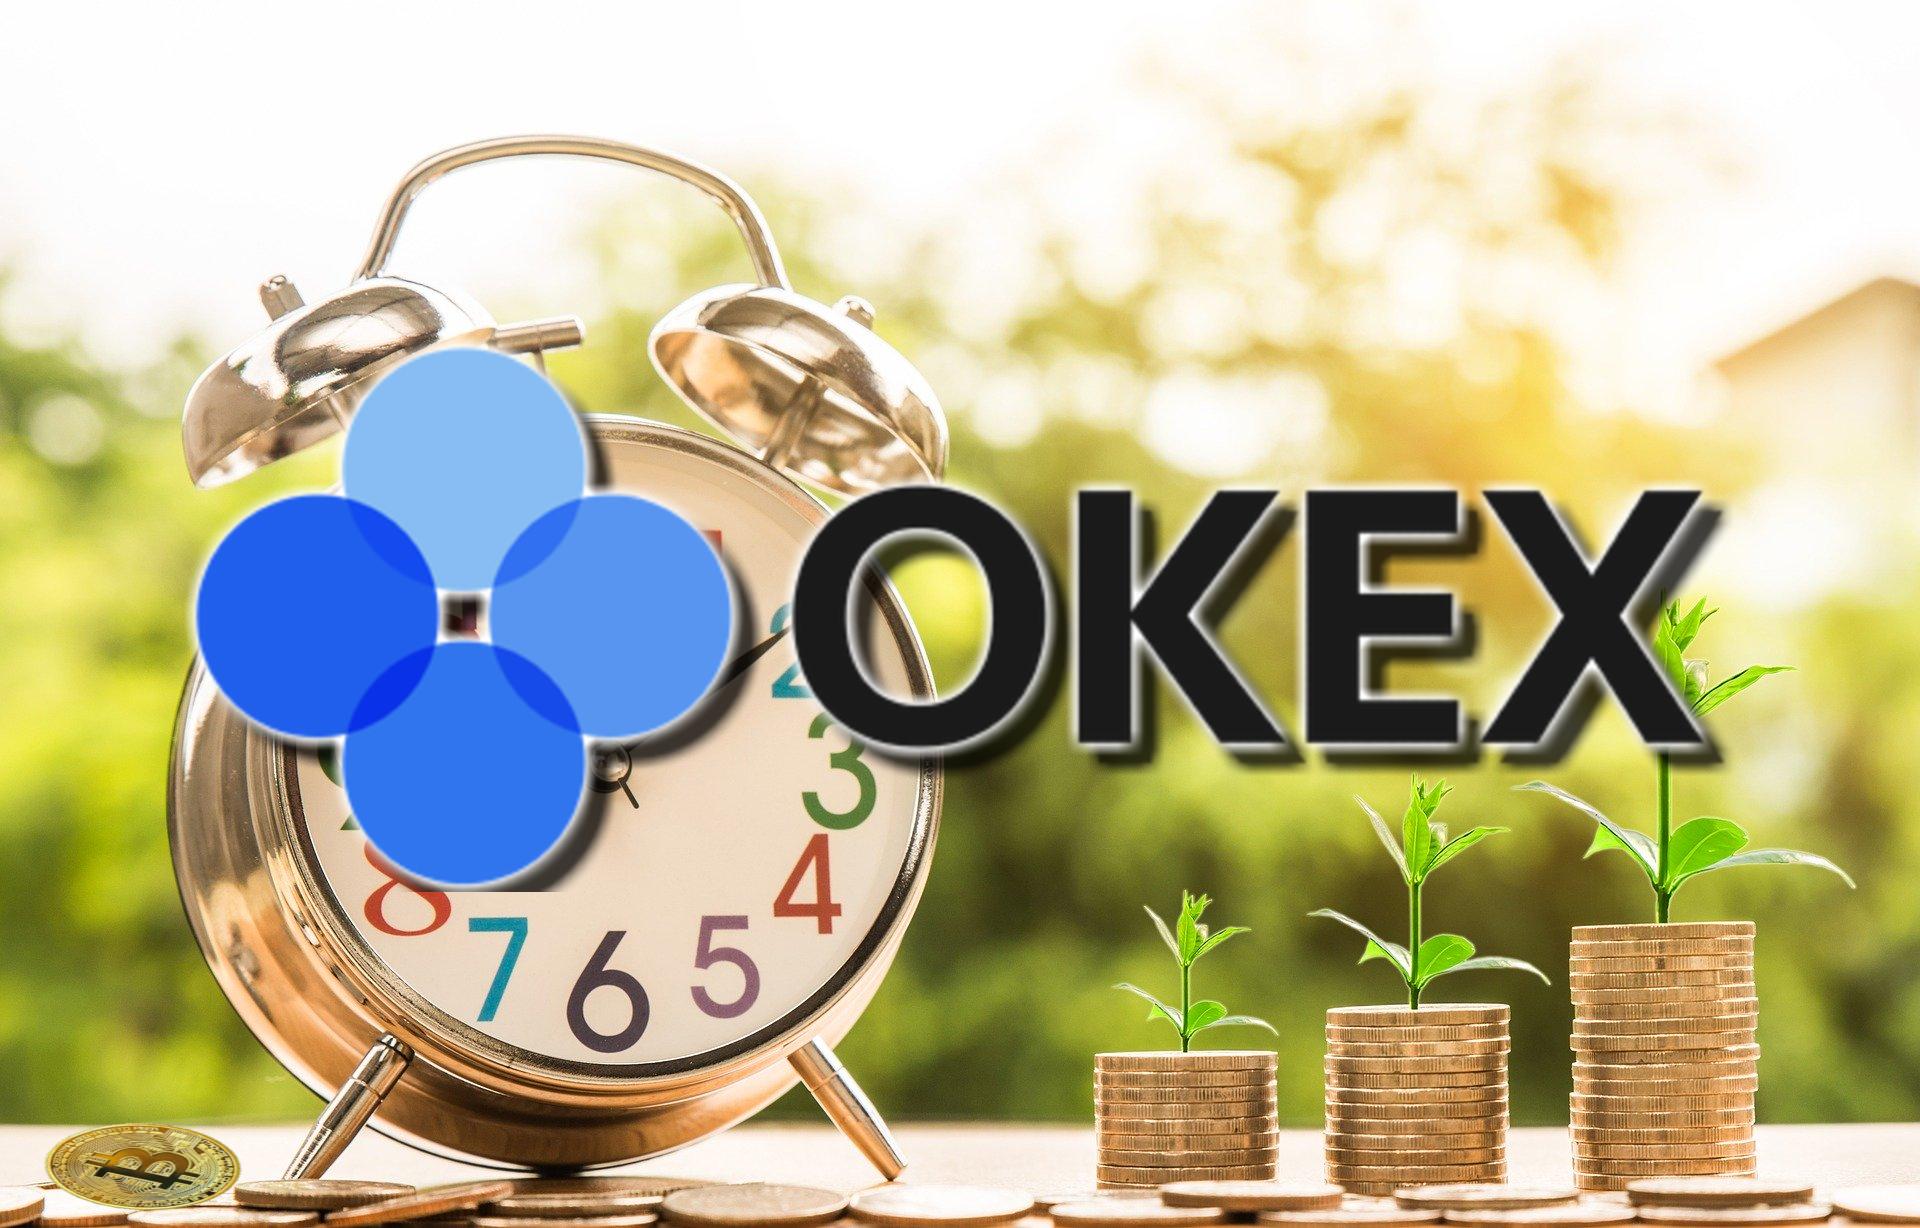 OKExが個人間の仮想通貨ローンサービス「C2Cローン」を開始